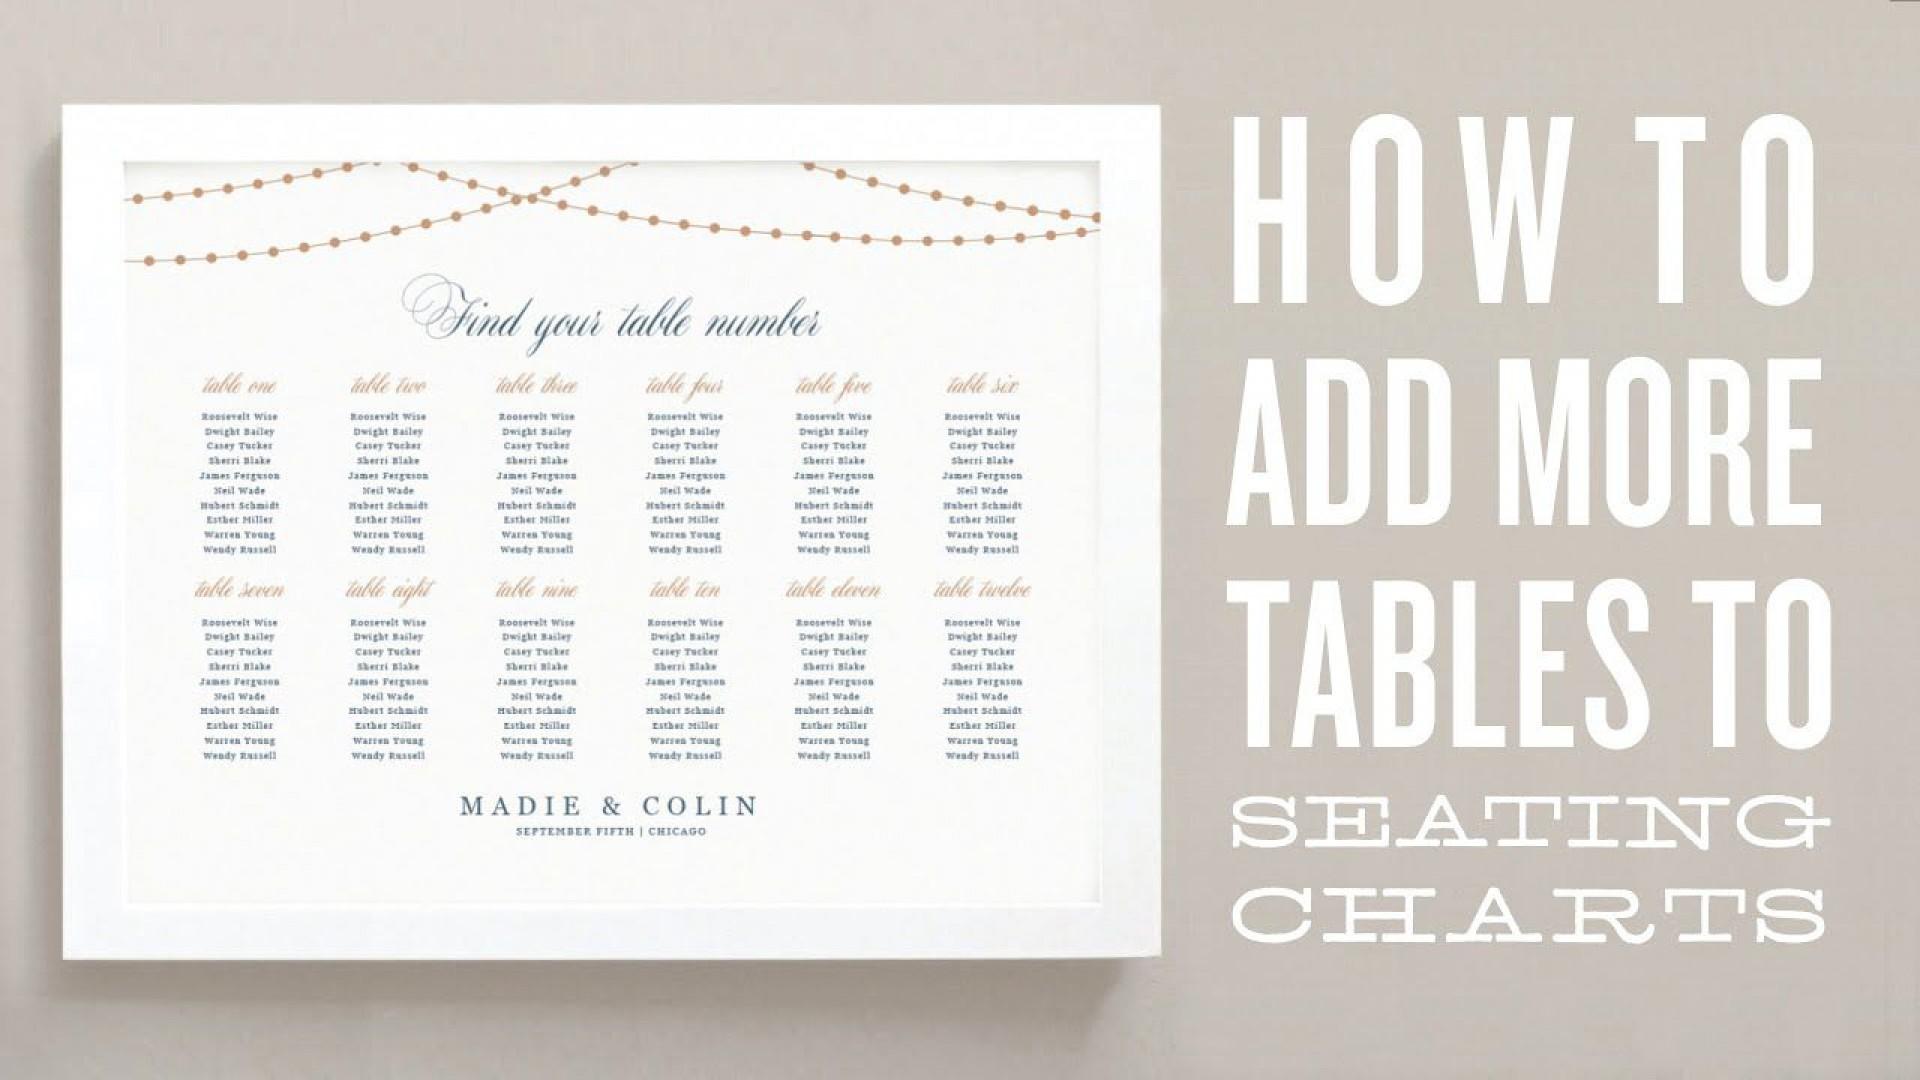 003 Beautiful Seating Chart Template Word Image  Wedding Microsoft Free 10 Per Table1920